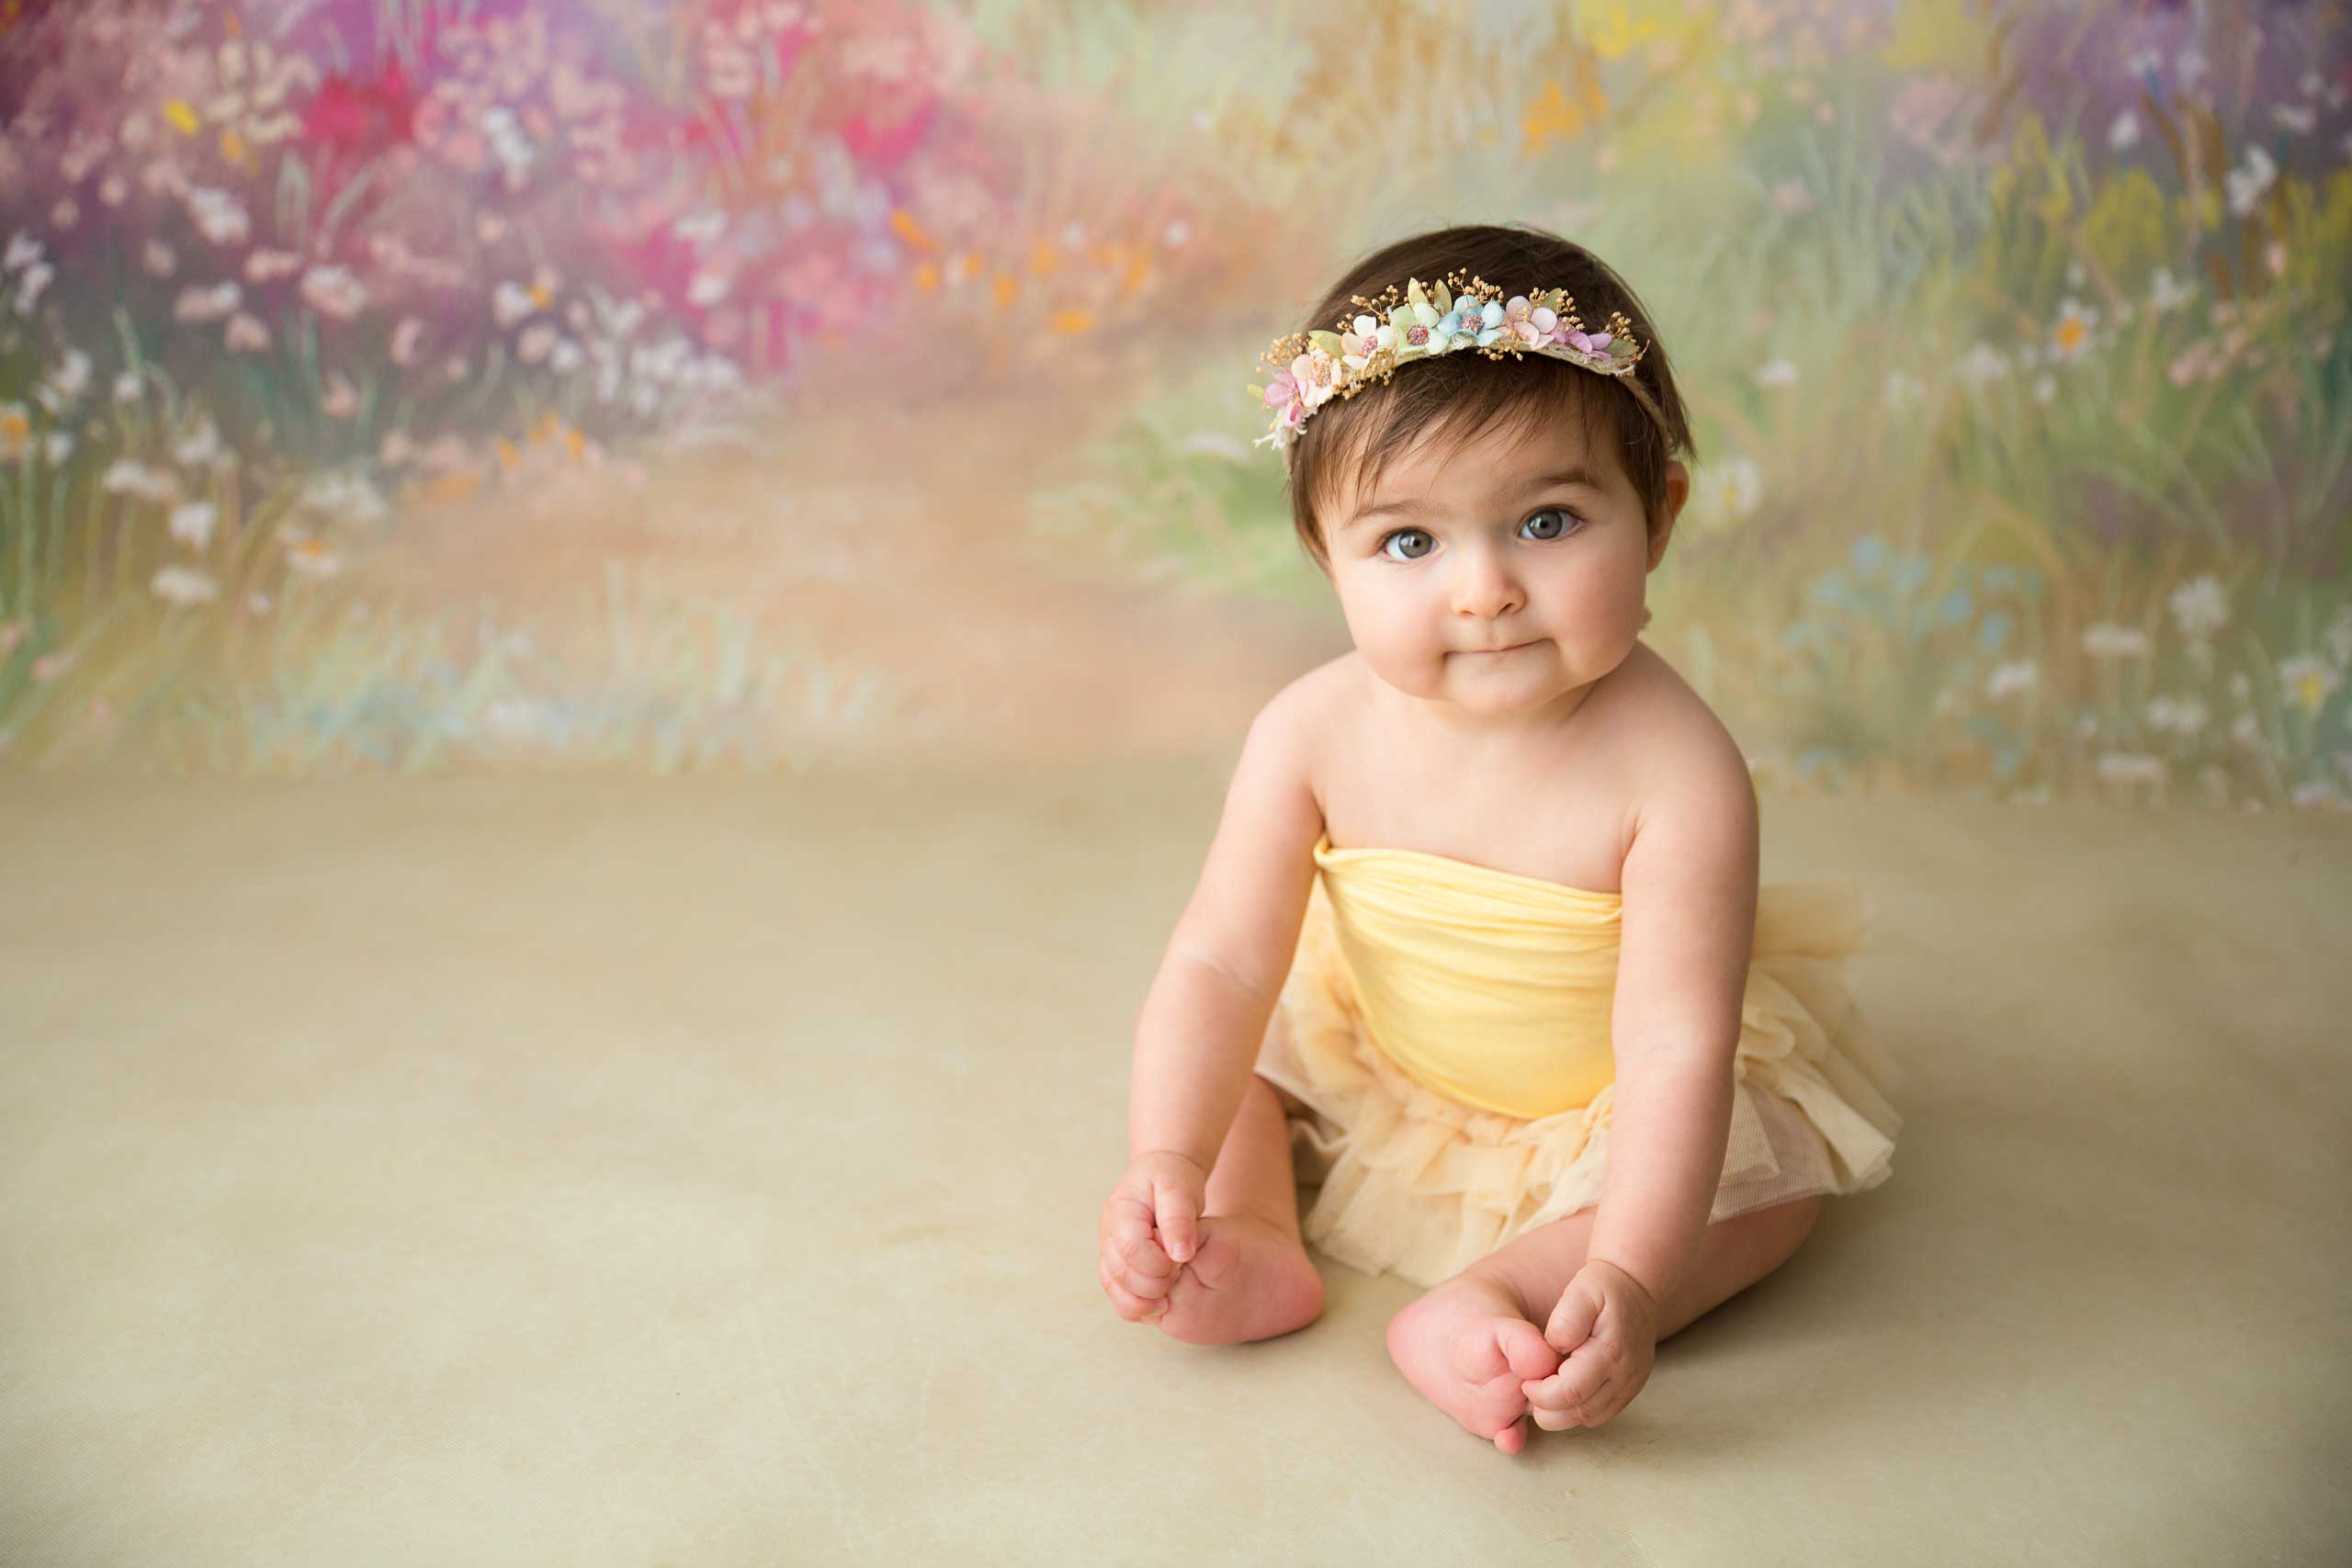 baby sitter photography los angeles ramina magid